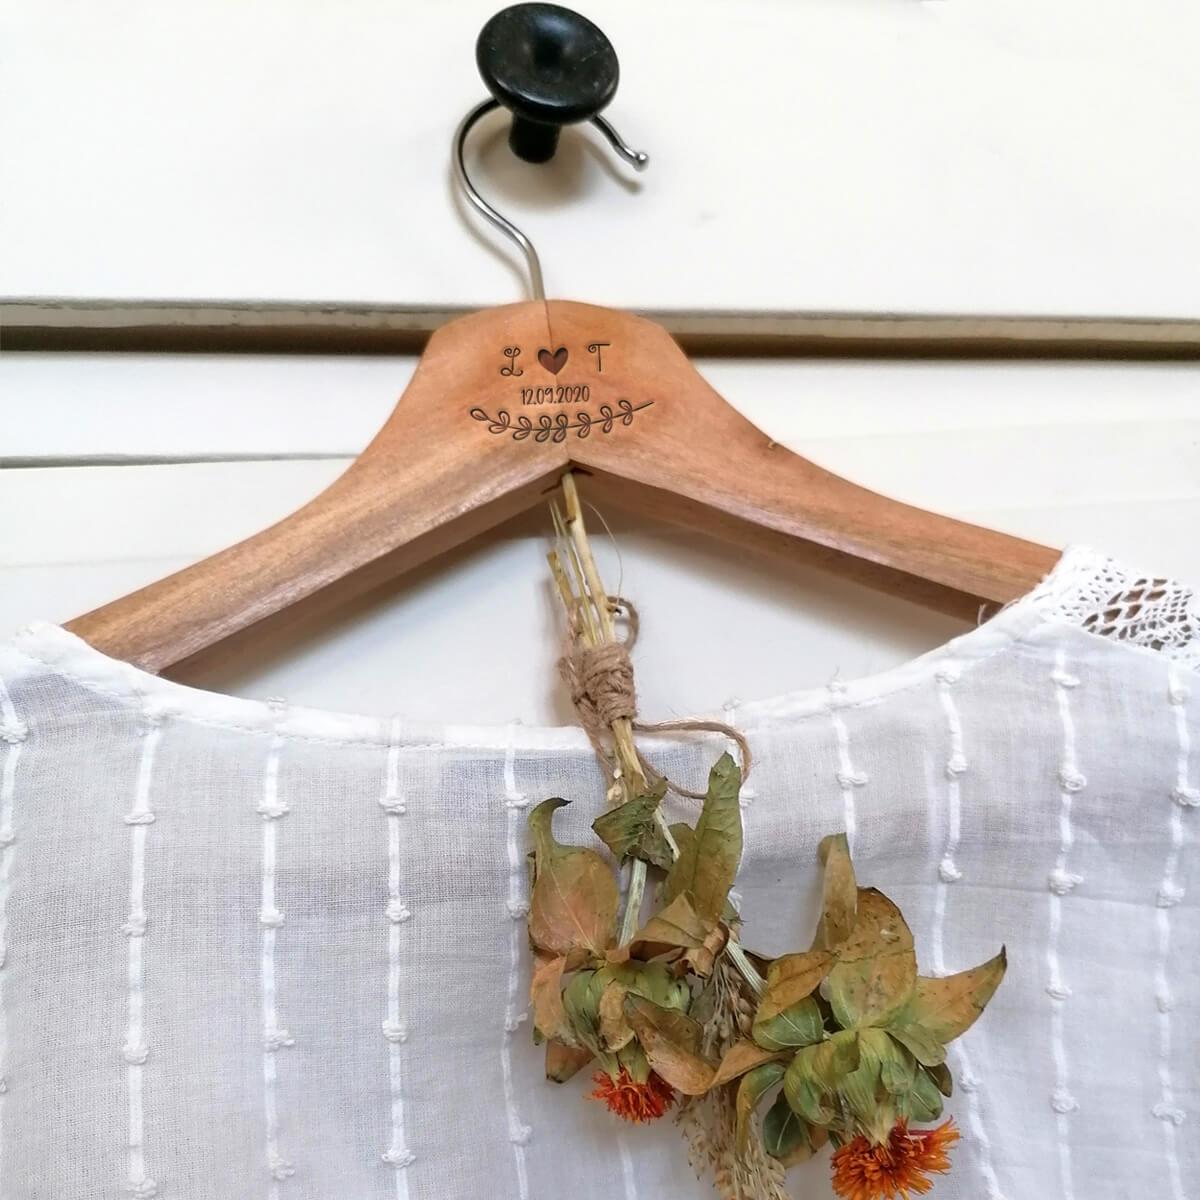 Staat leuk aan elke kapstok of kledingkast, deze personaliseerbare kleerhangers